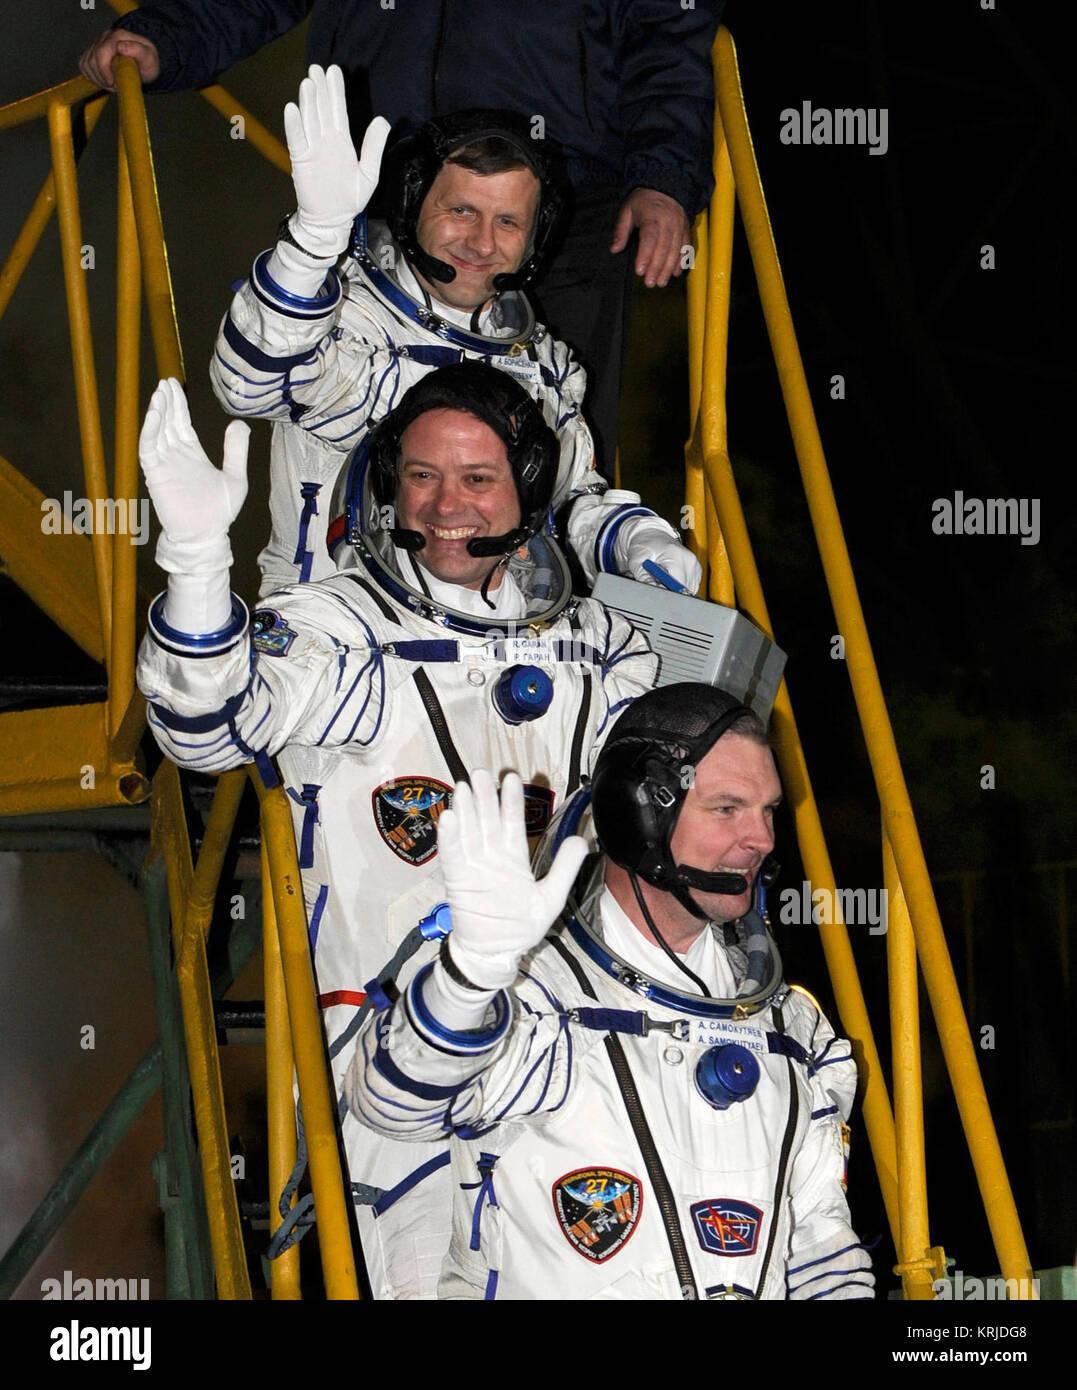 Expedition 27 crew members from top, Russian Flight Engineer Andrey Borisenko, NASA Flight Engineer Ron Garan, and - Stock Image